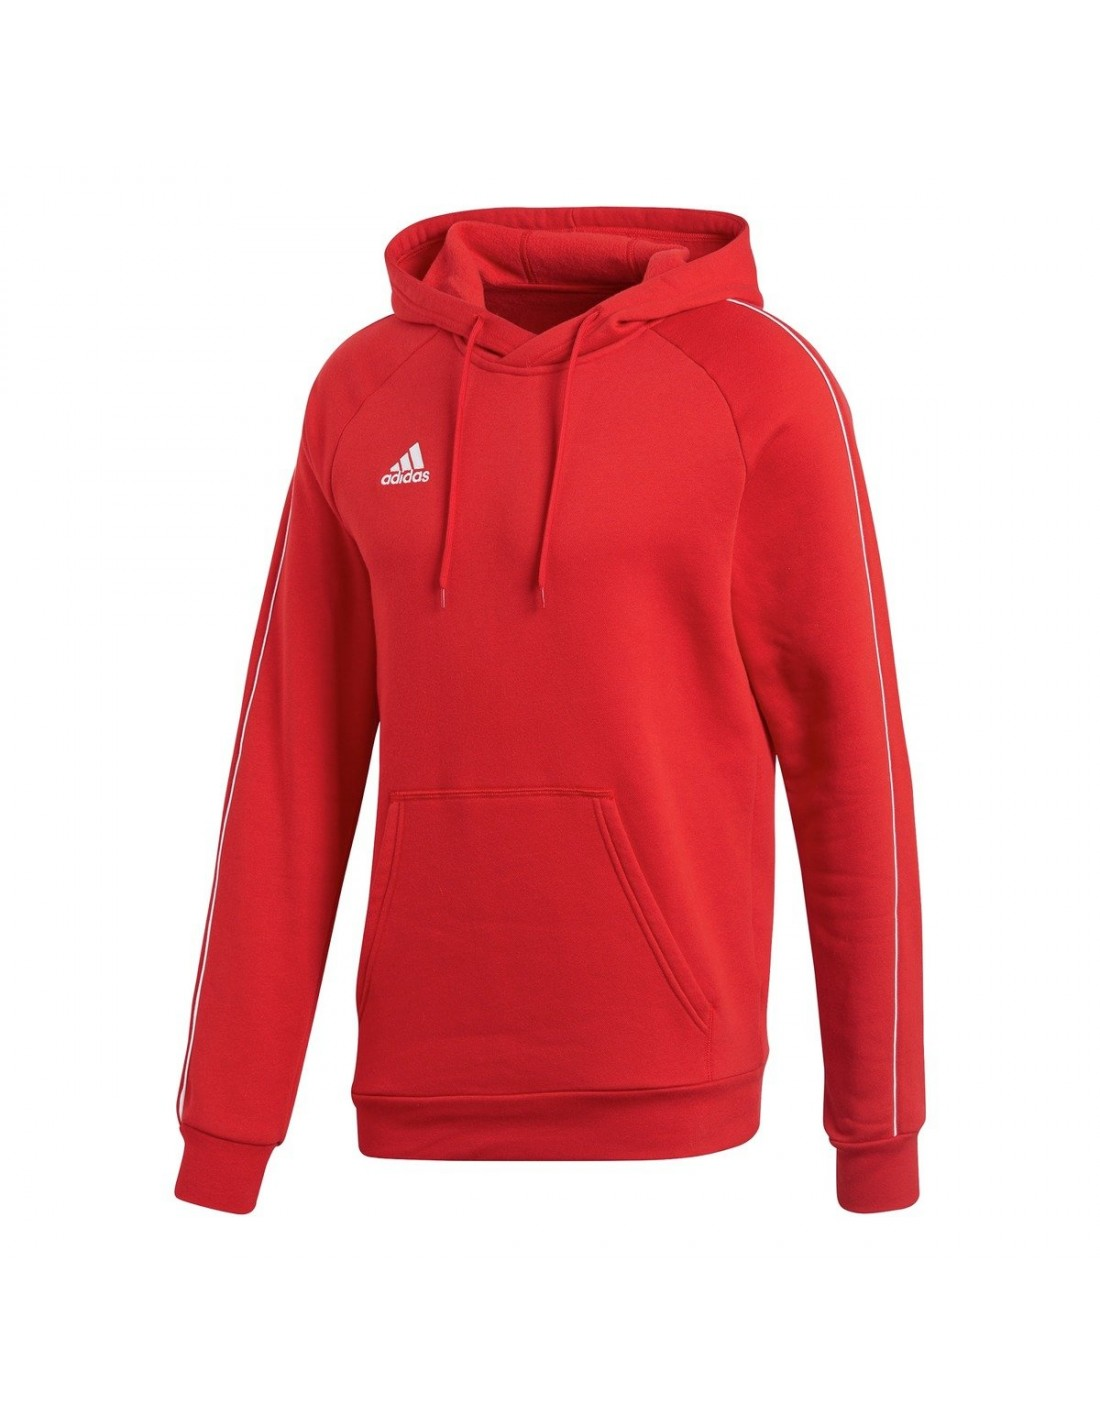 Genser Herrer Adidas Core18 Hoody Herre CV3337 399 kr